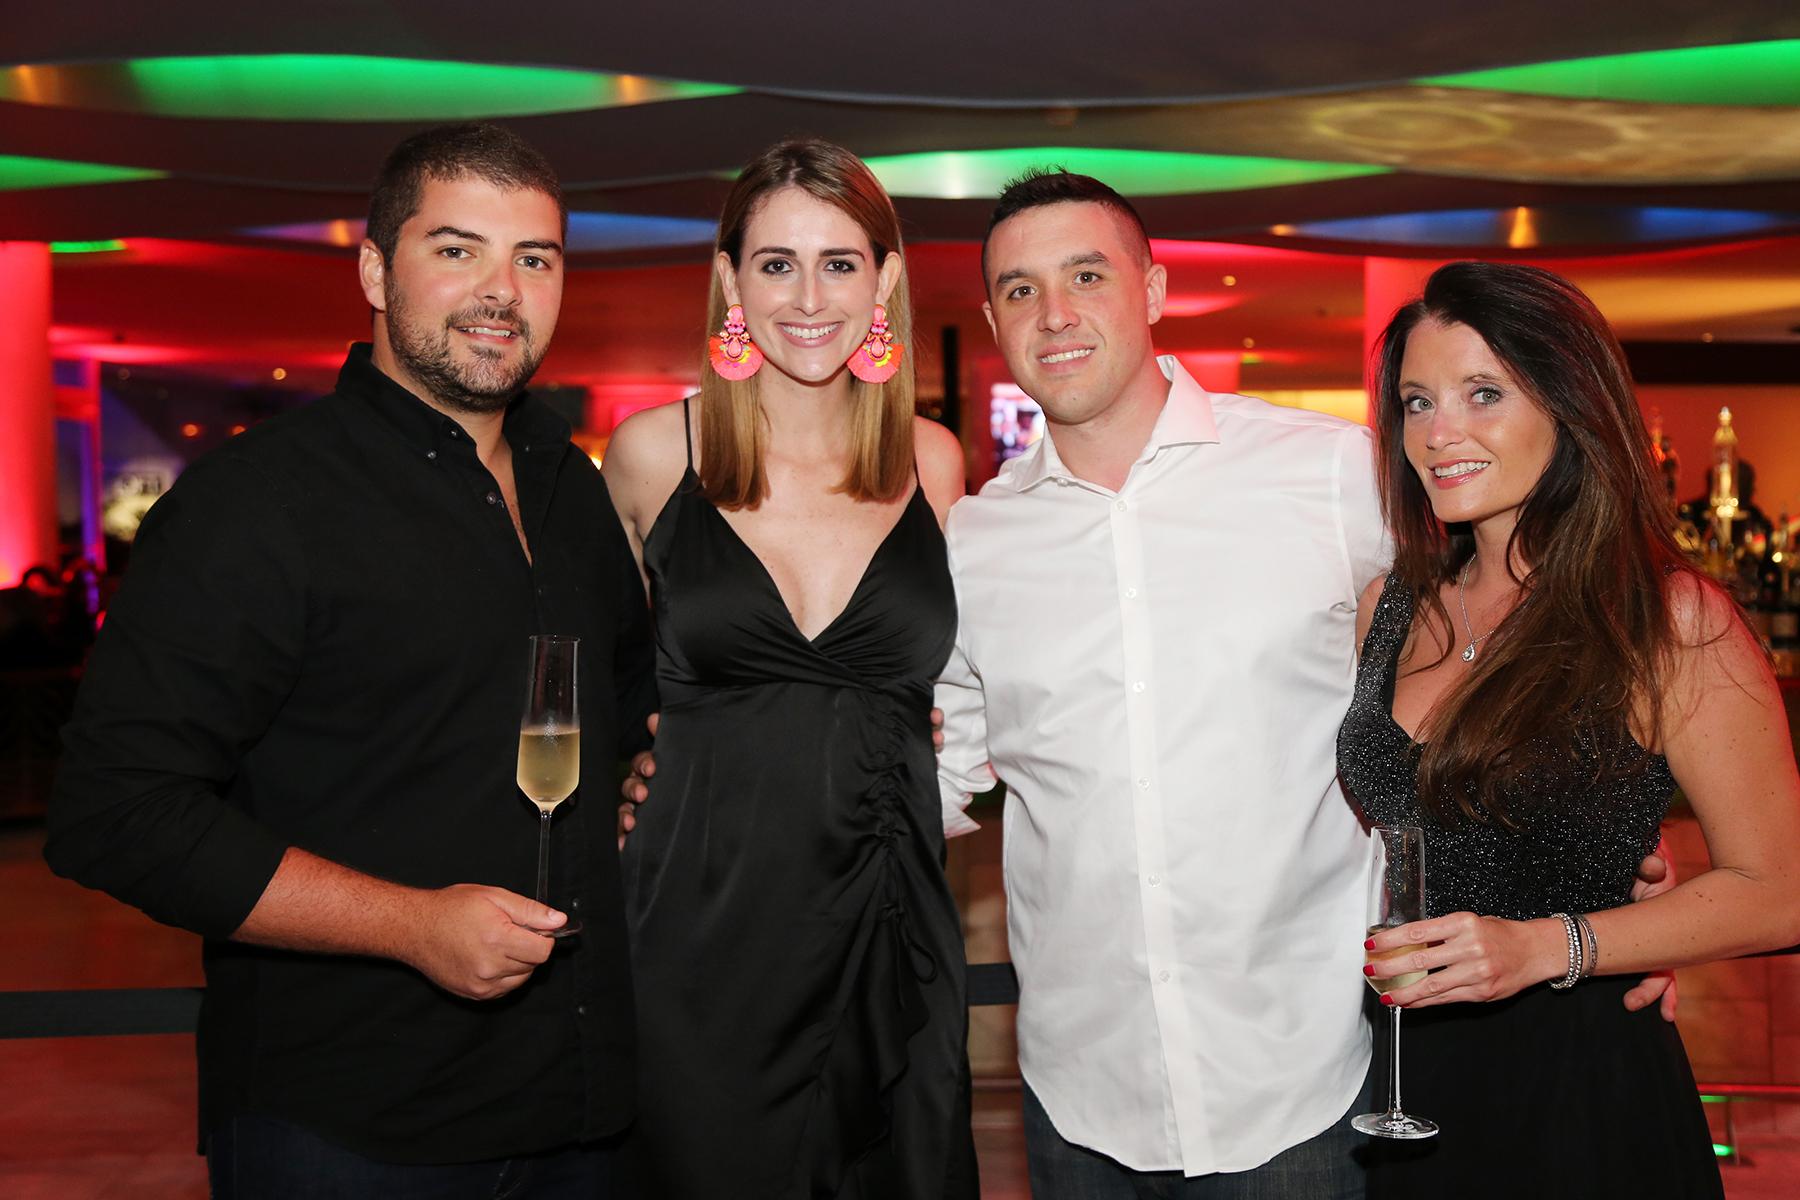 Jorge Mutelier, María del Mar Saldaña, James Hogan, Jenni Eaves.  (Nichole Saldarriaga)